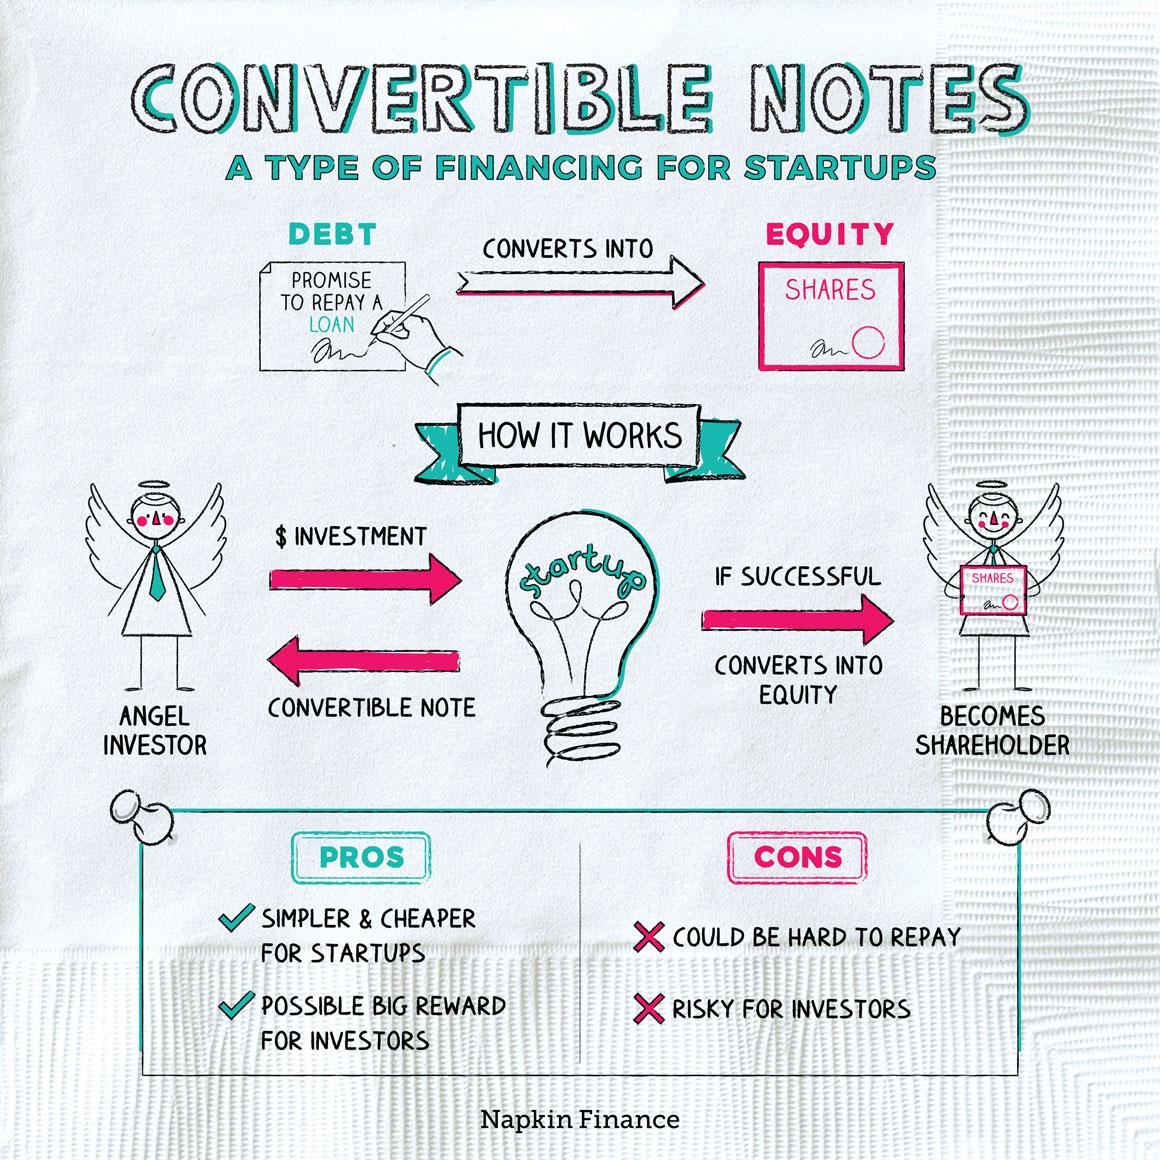 Convertible Notes